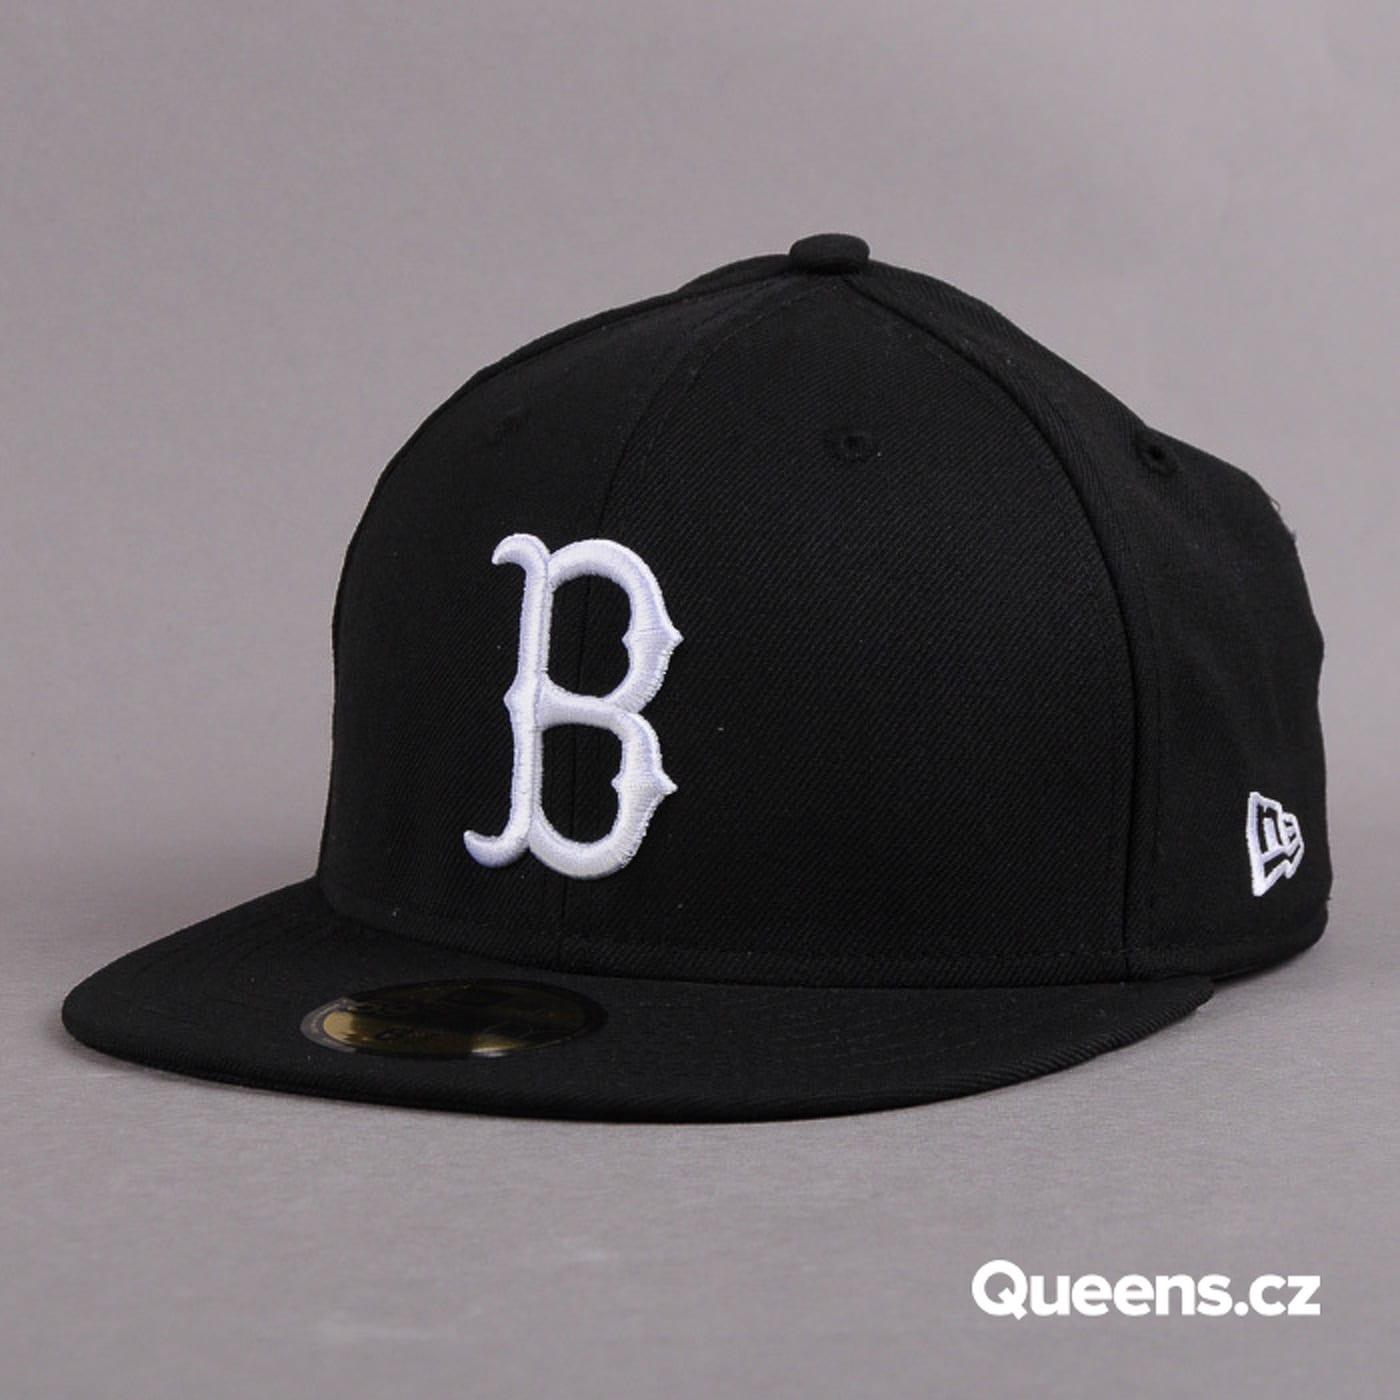 New Era MLB Basic B black / white